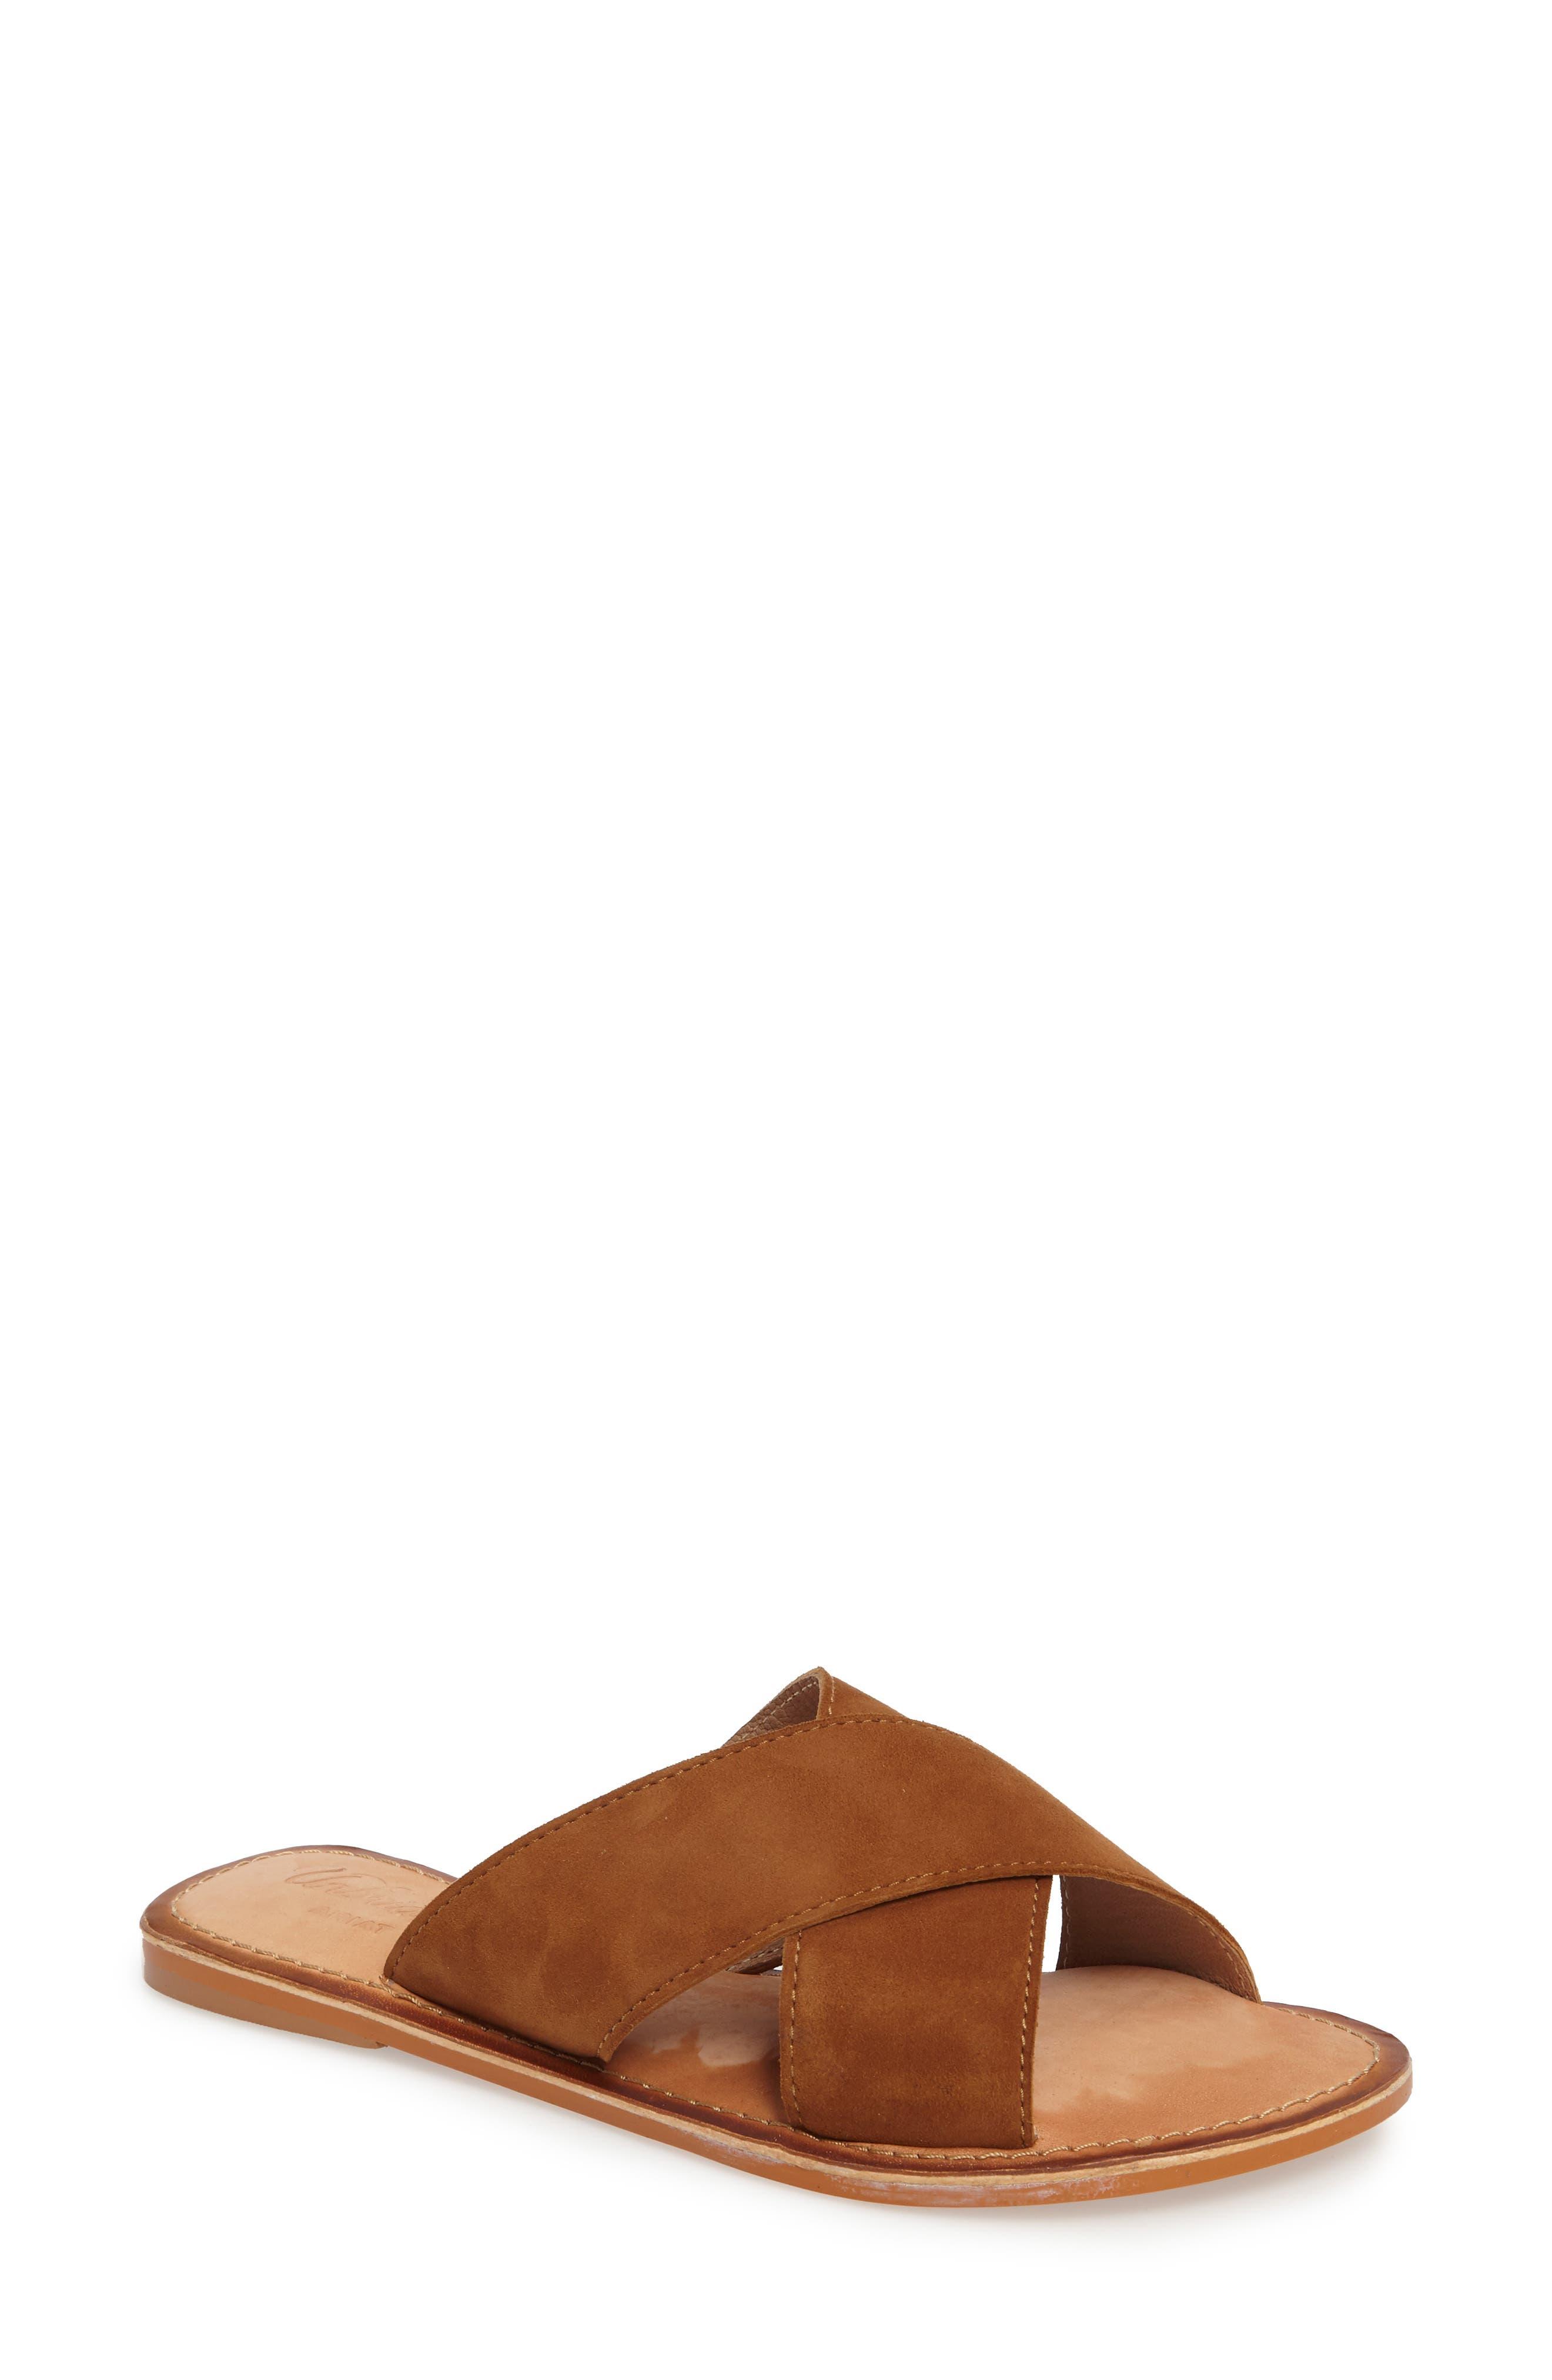 Unbridled Ava Sandal,                         Main,                         color, 200